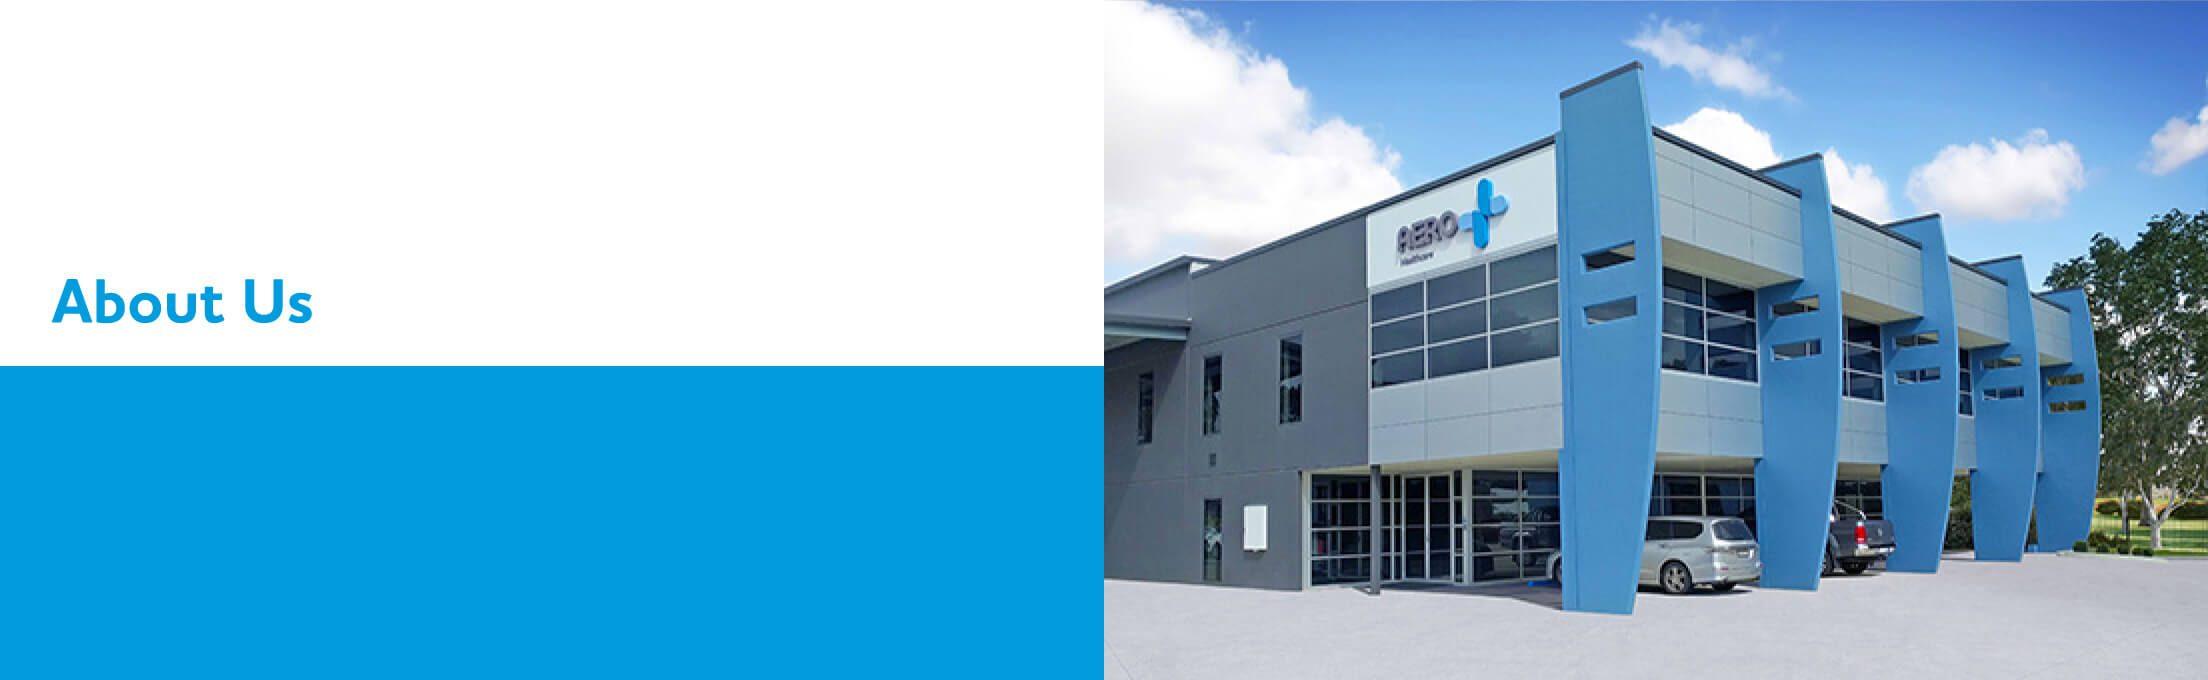 About Aero Healthcare Building